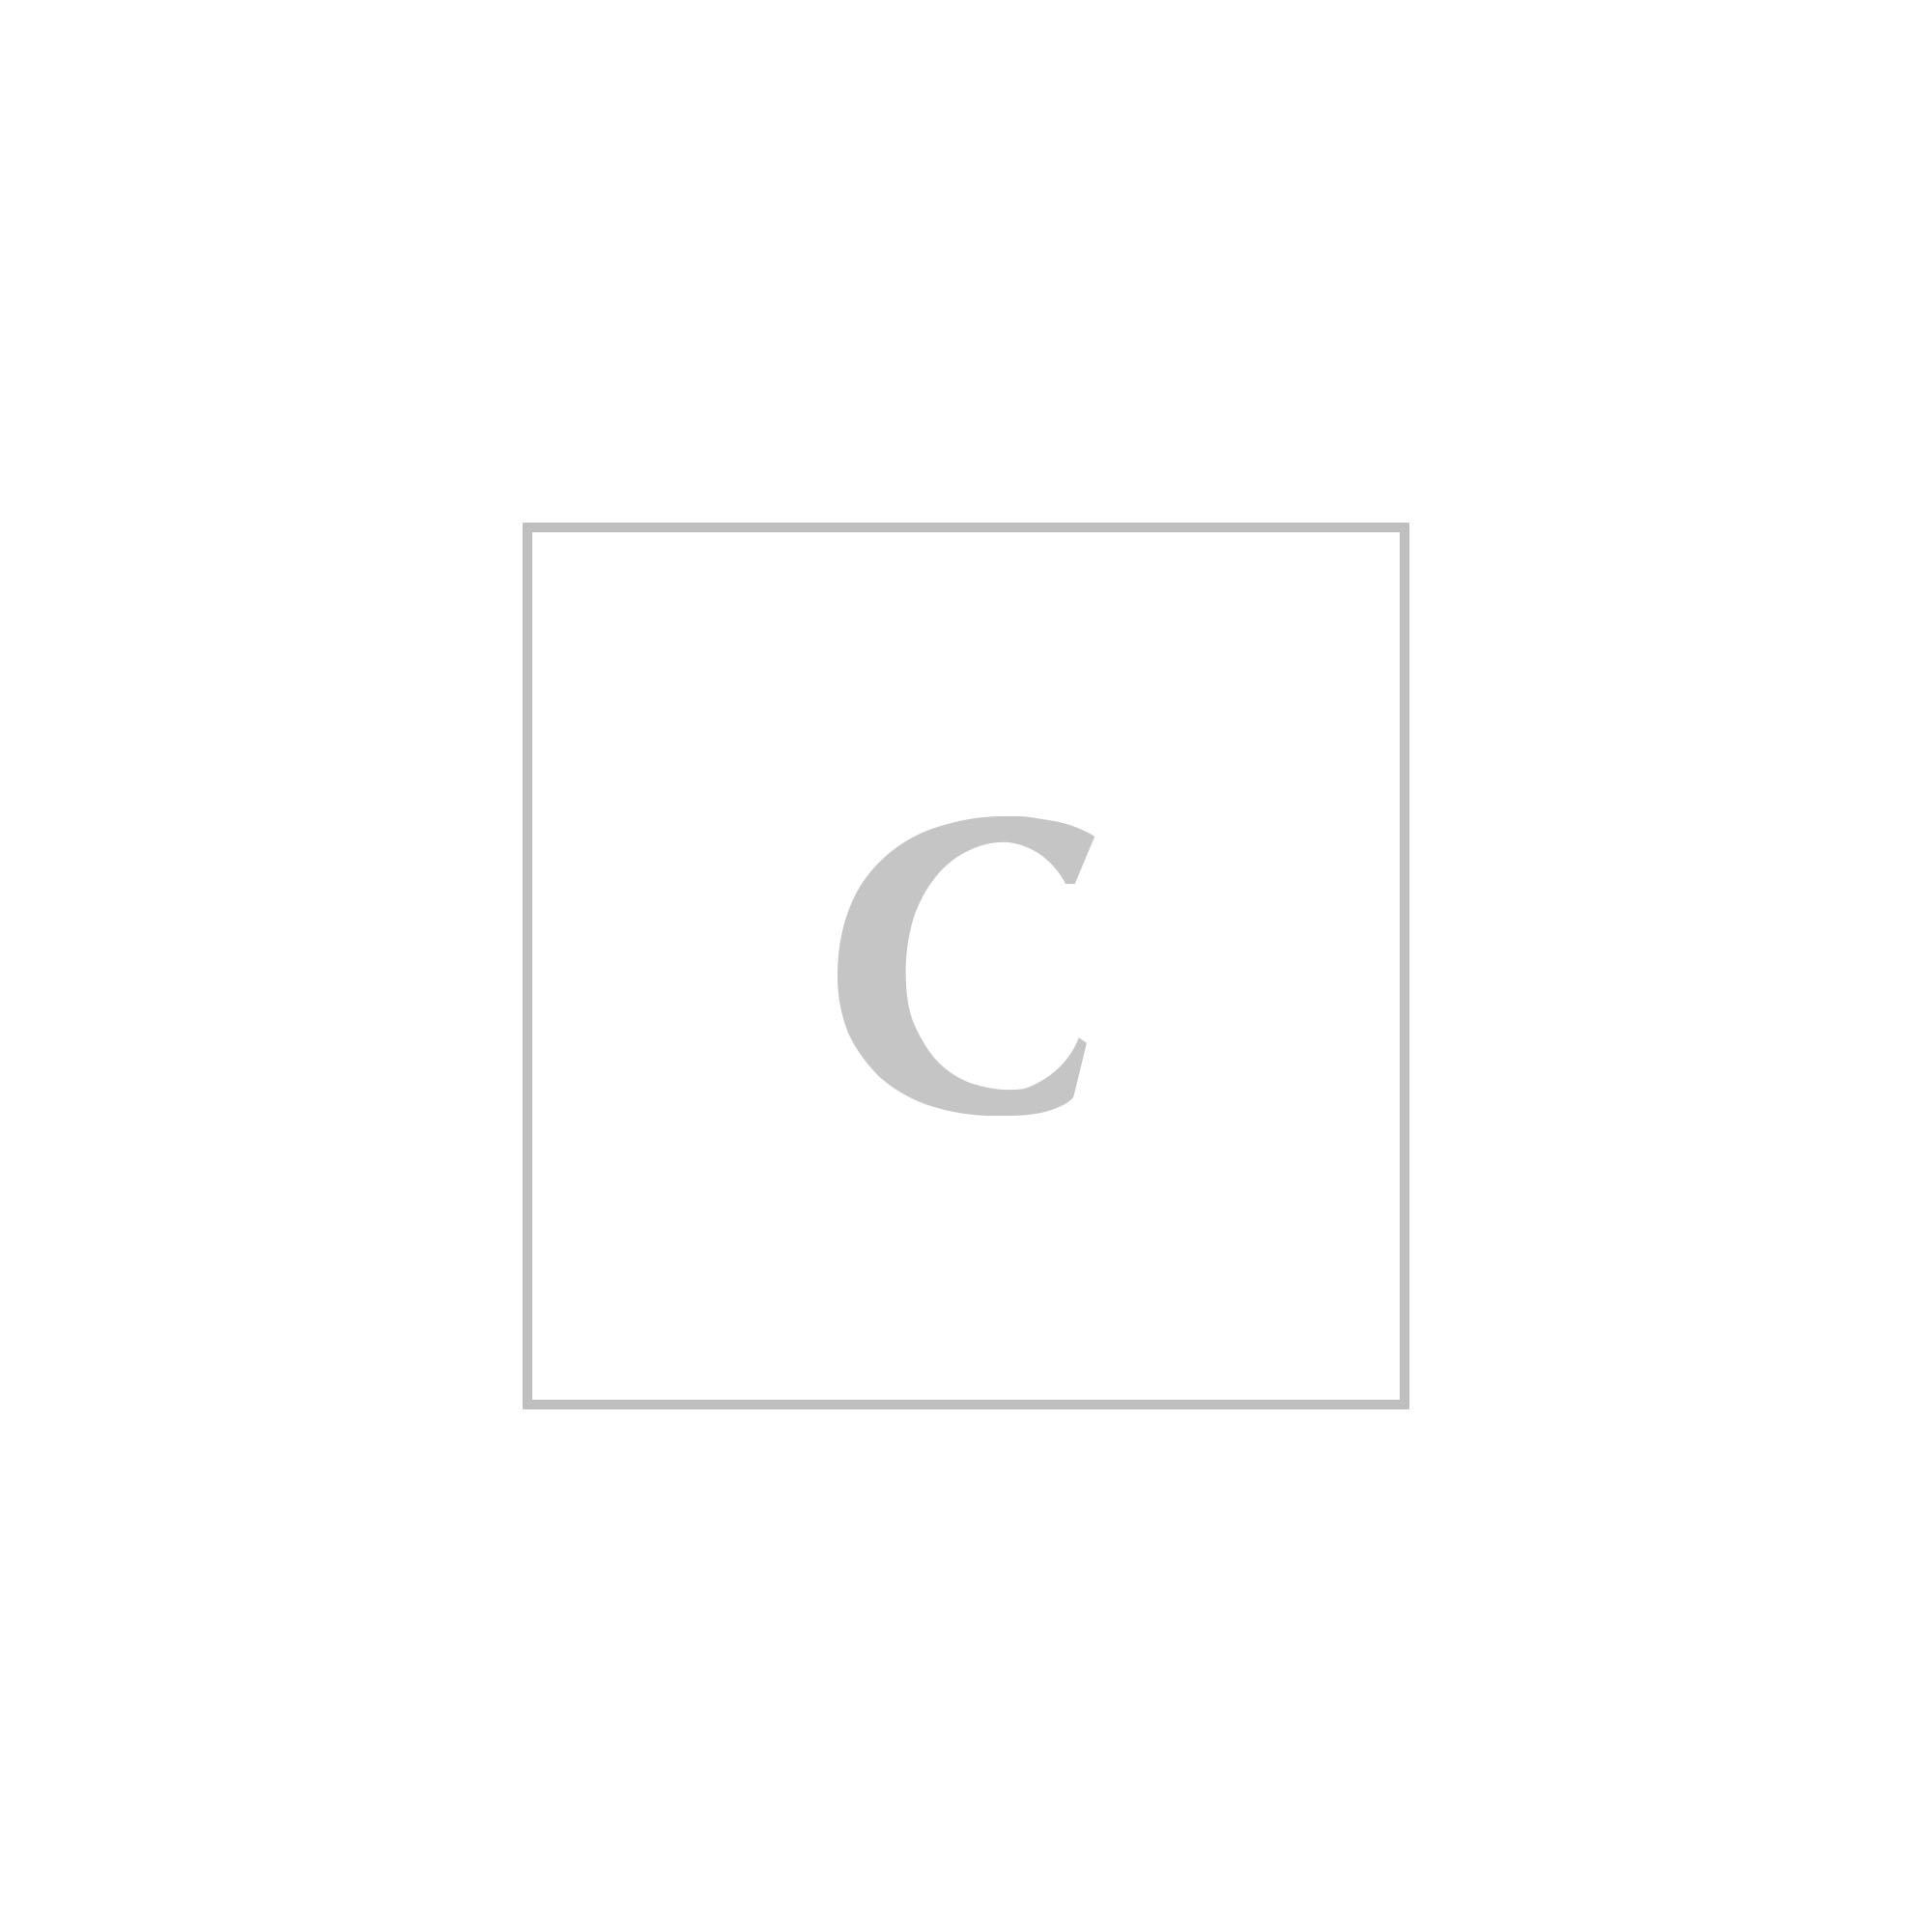 stella mccartney bags women python print clutch